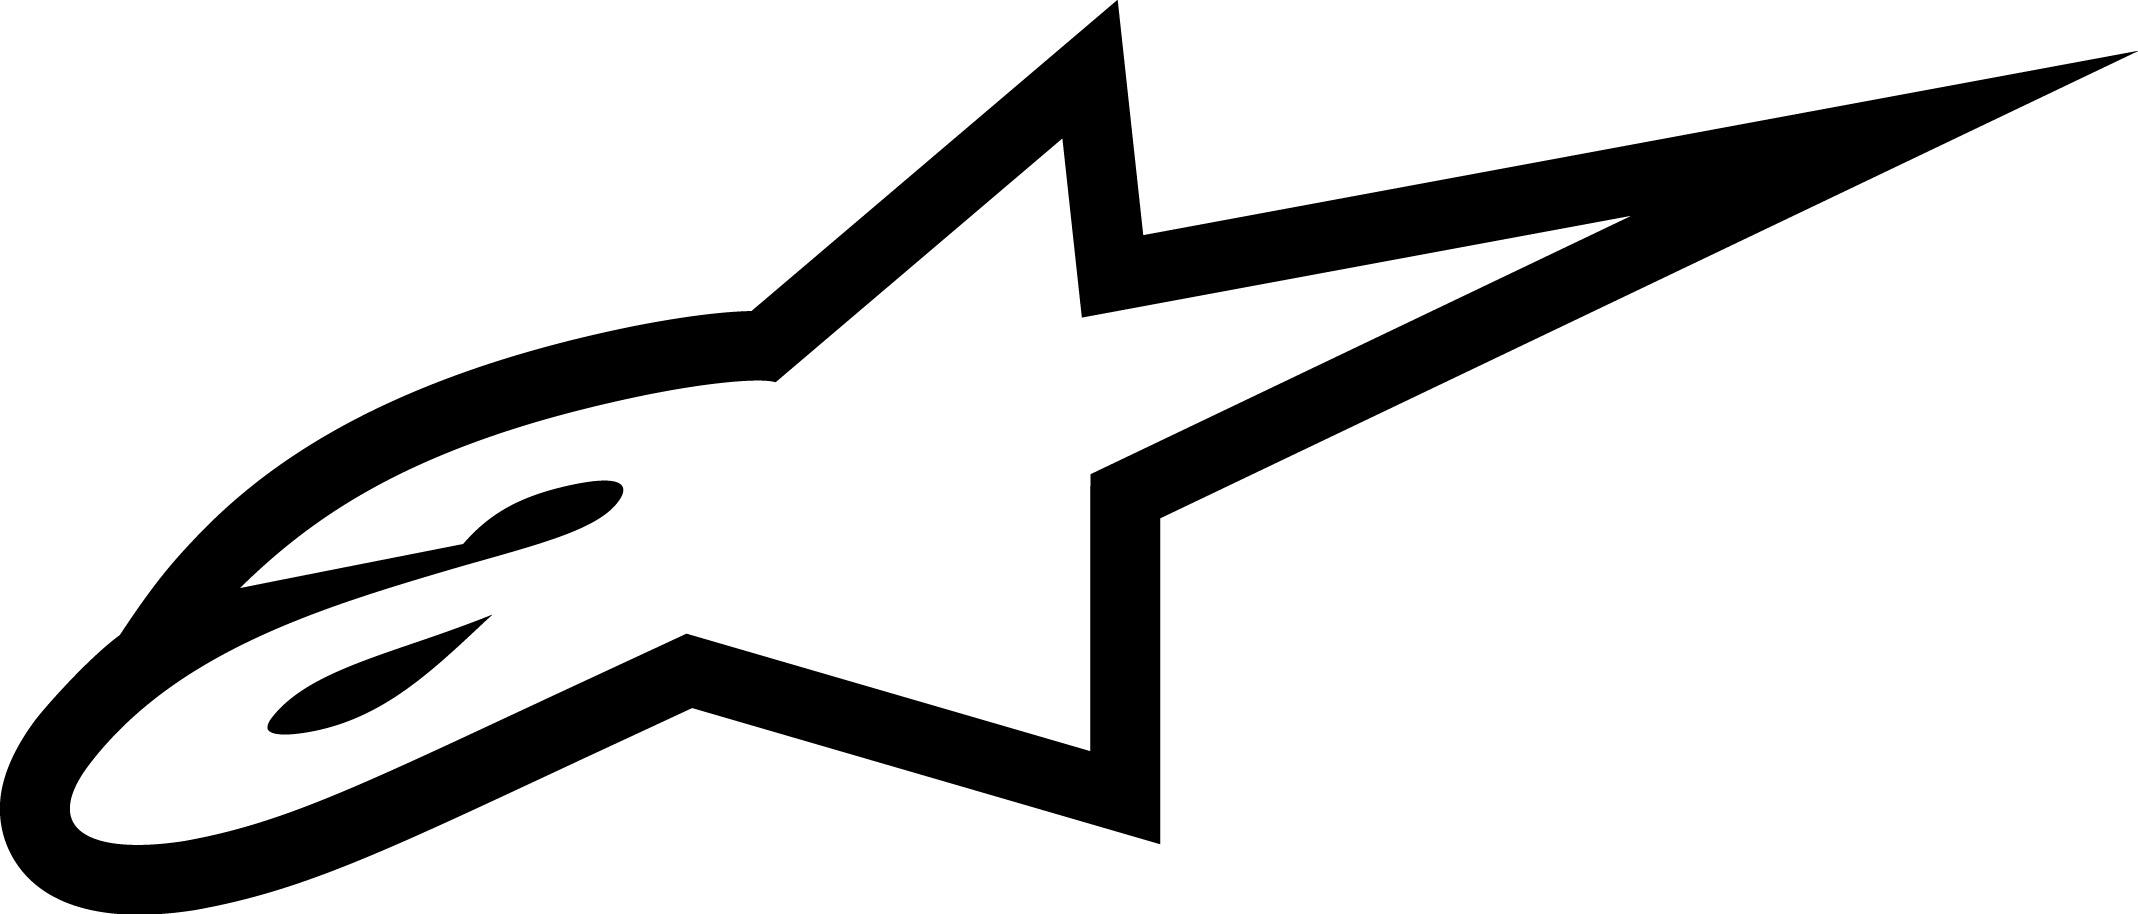 Logo Alpinestar Auto Design Tech 2138x914